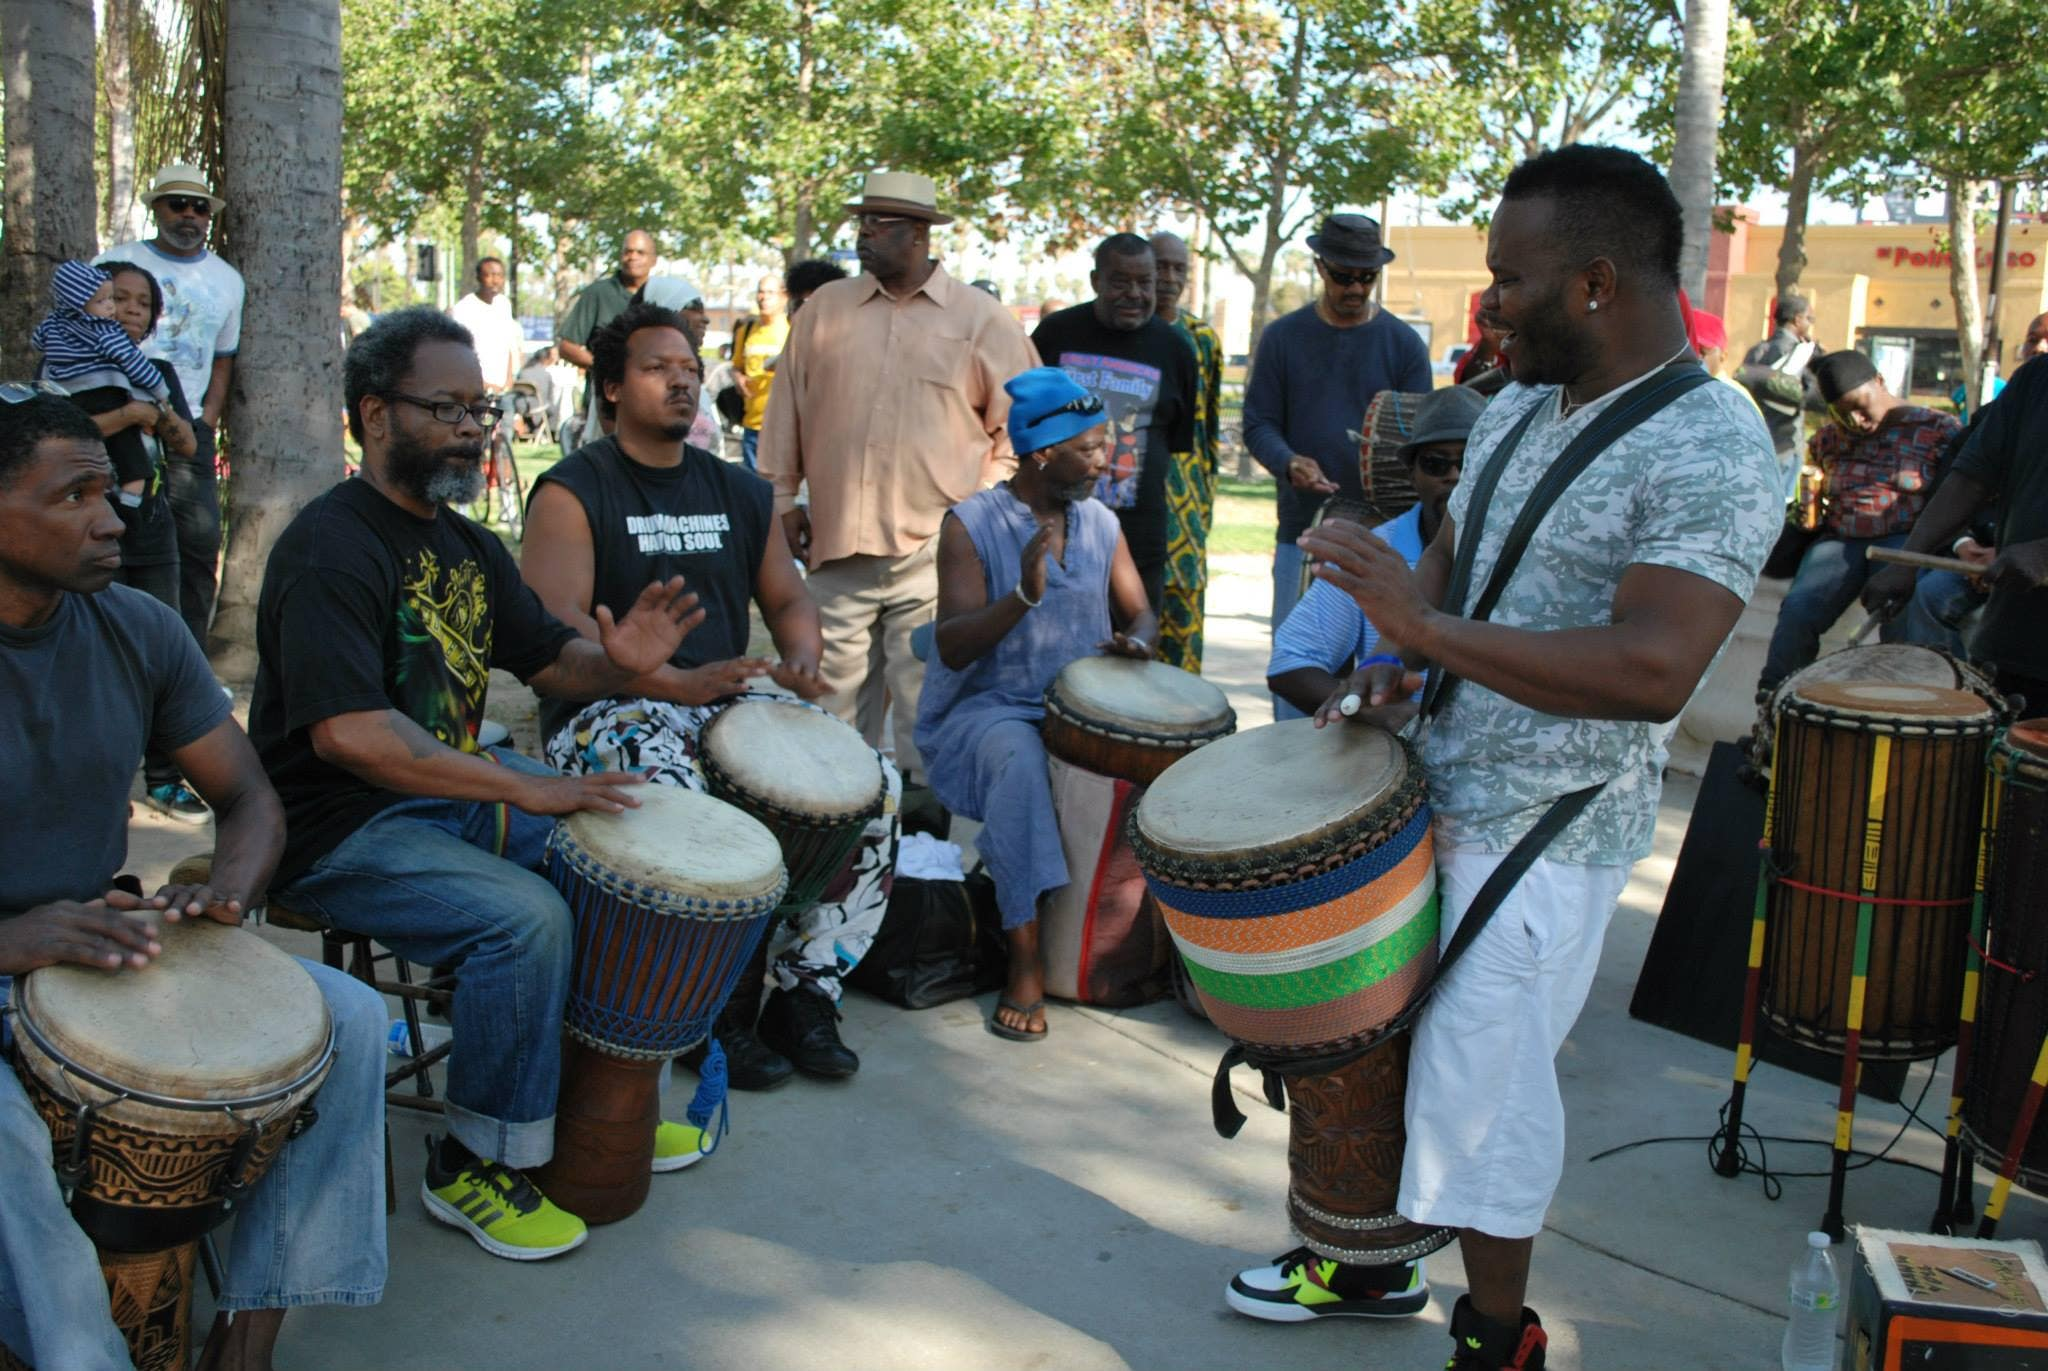 The famous drum circle at Leimert Plaza Park